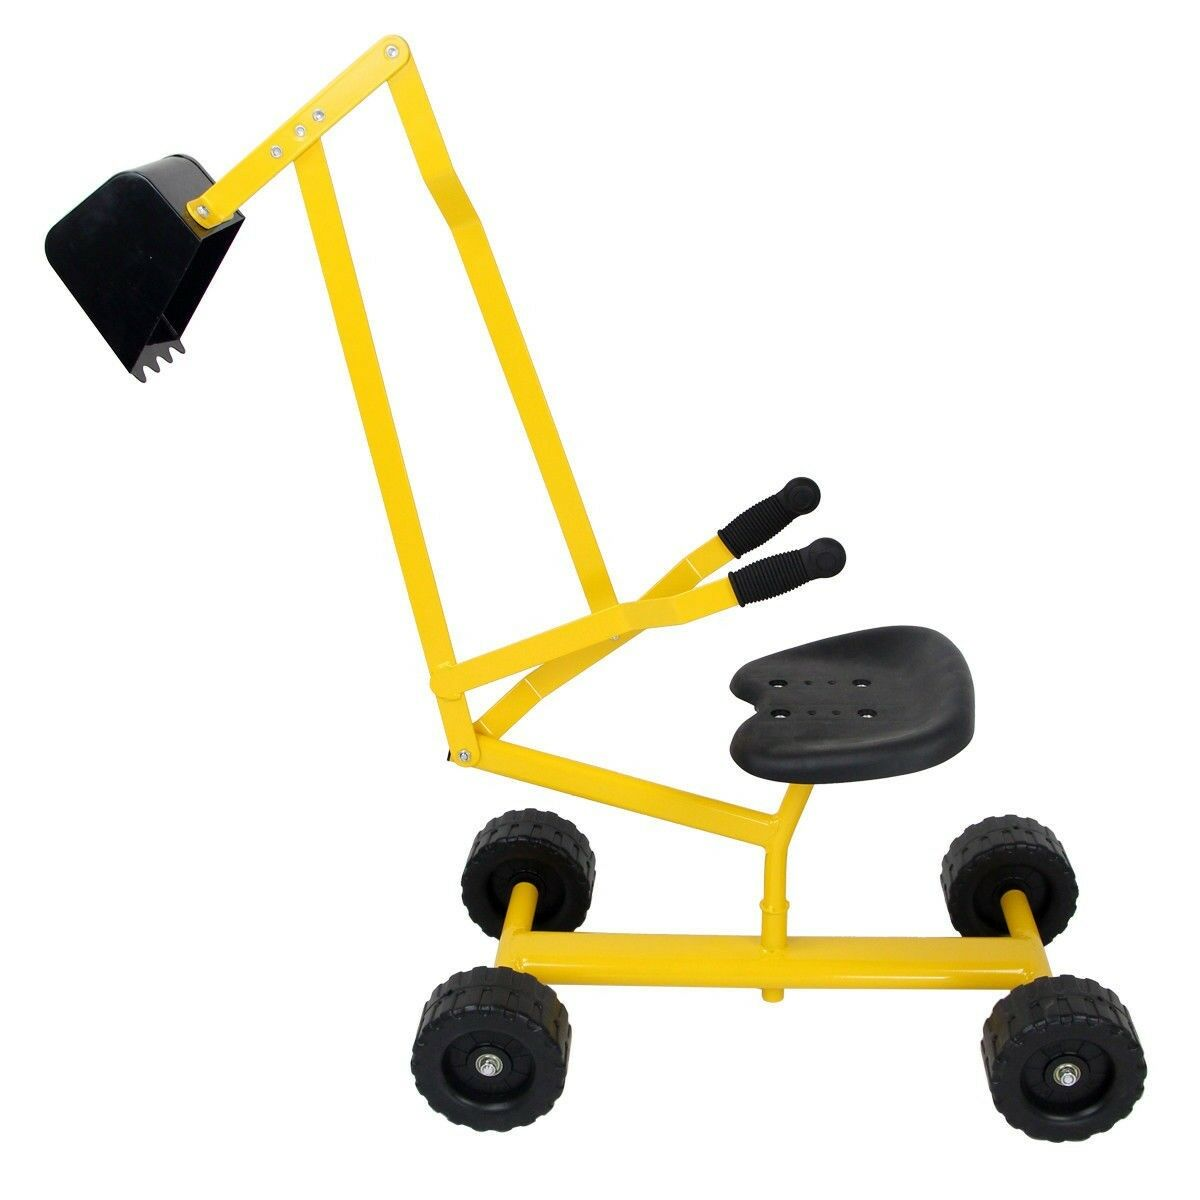 Heavy Duty Kids Ride-on Ride-on Ride-on Sand Digger Sandbox Digging Scooper Crane Excavator Toy d00f78